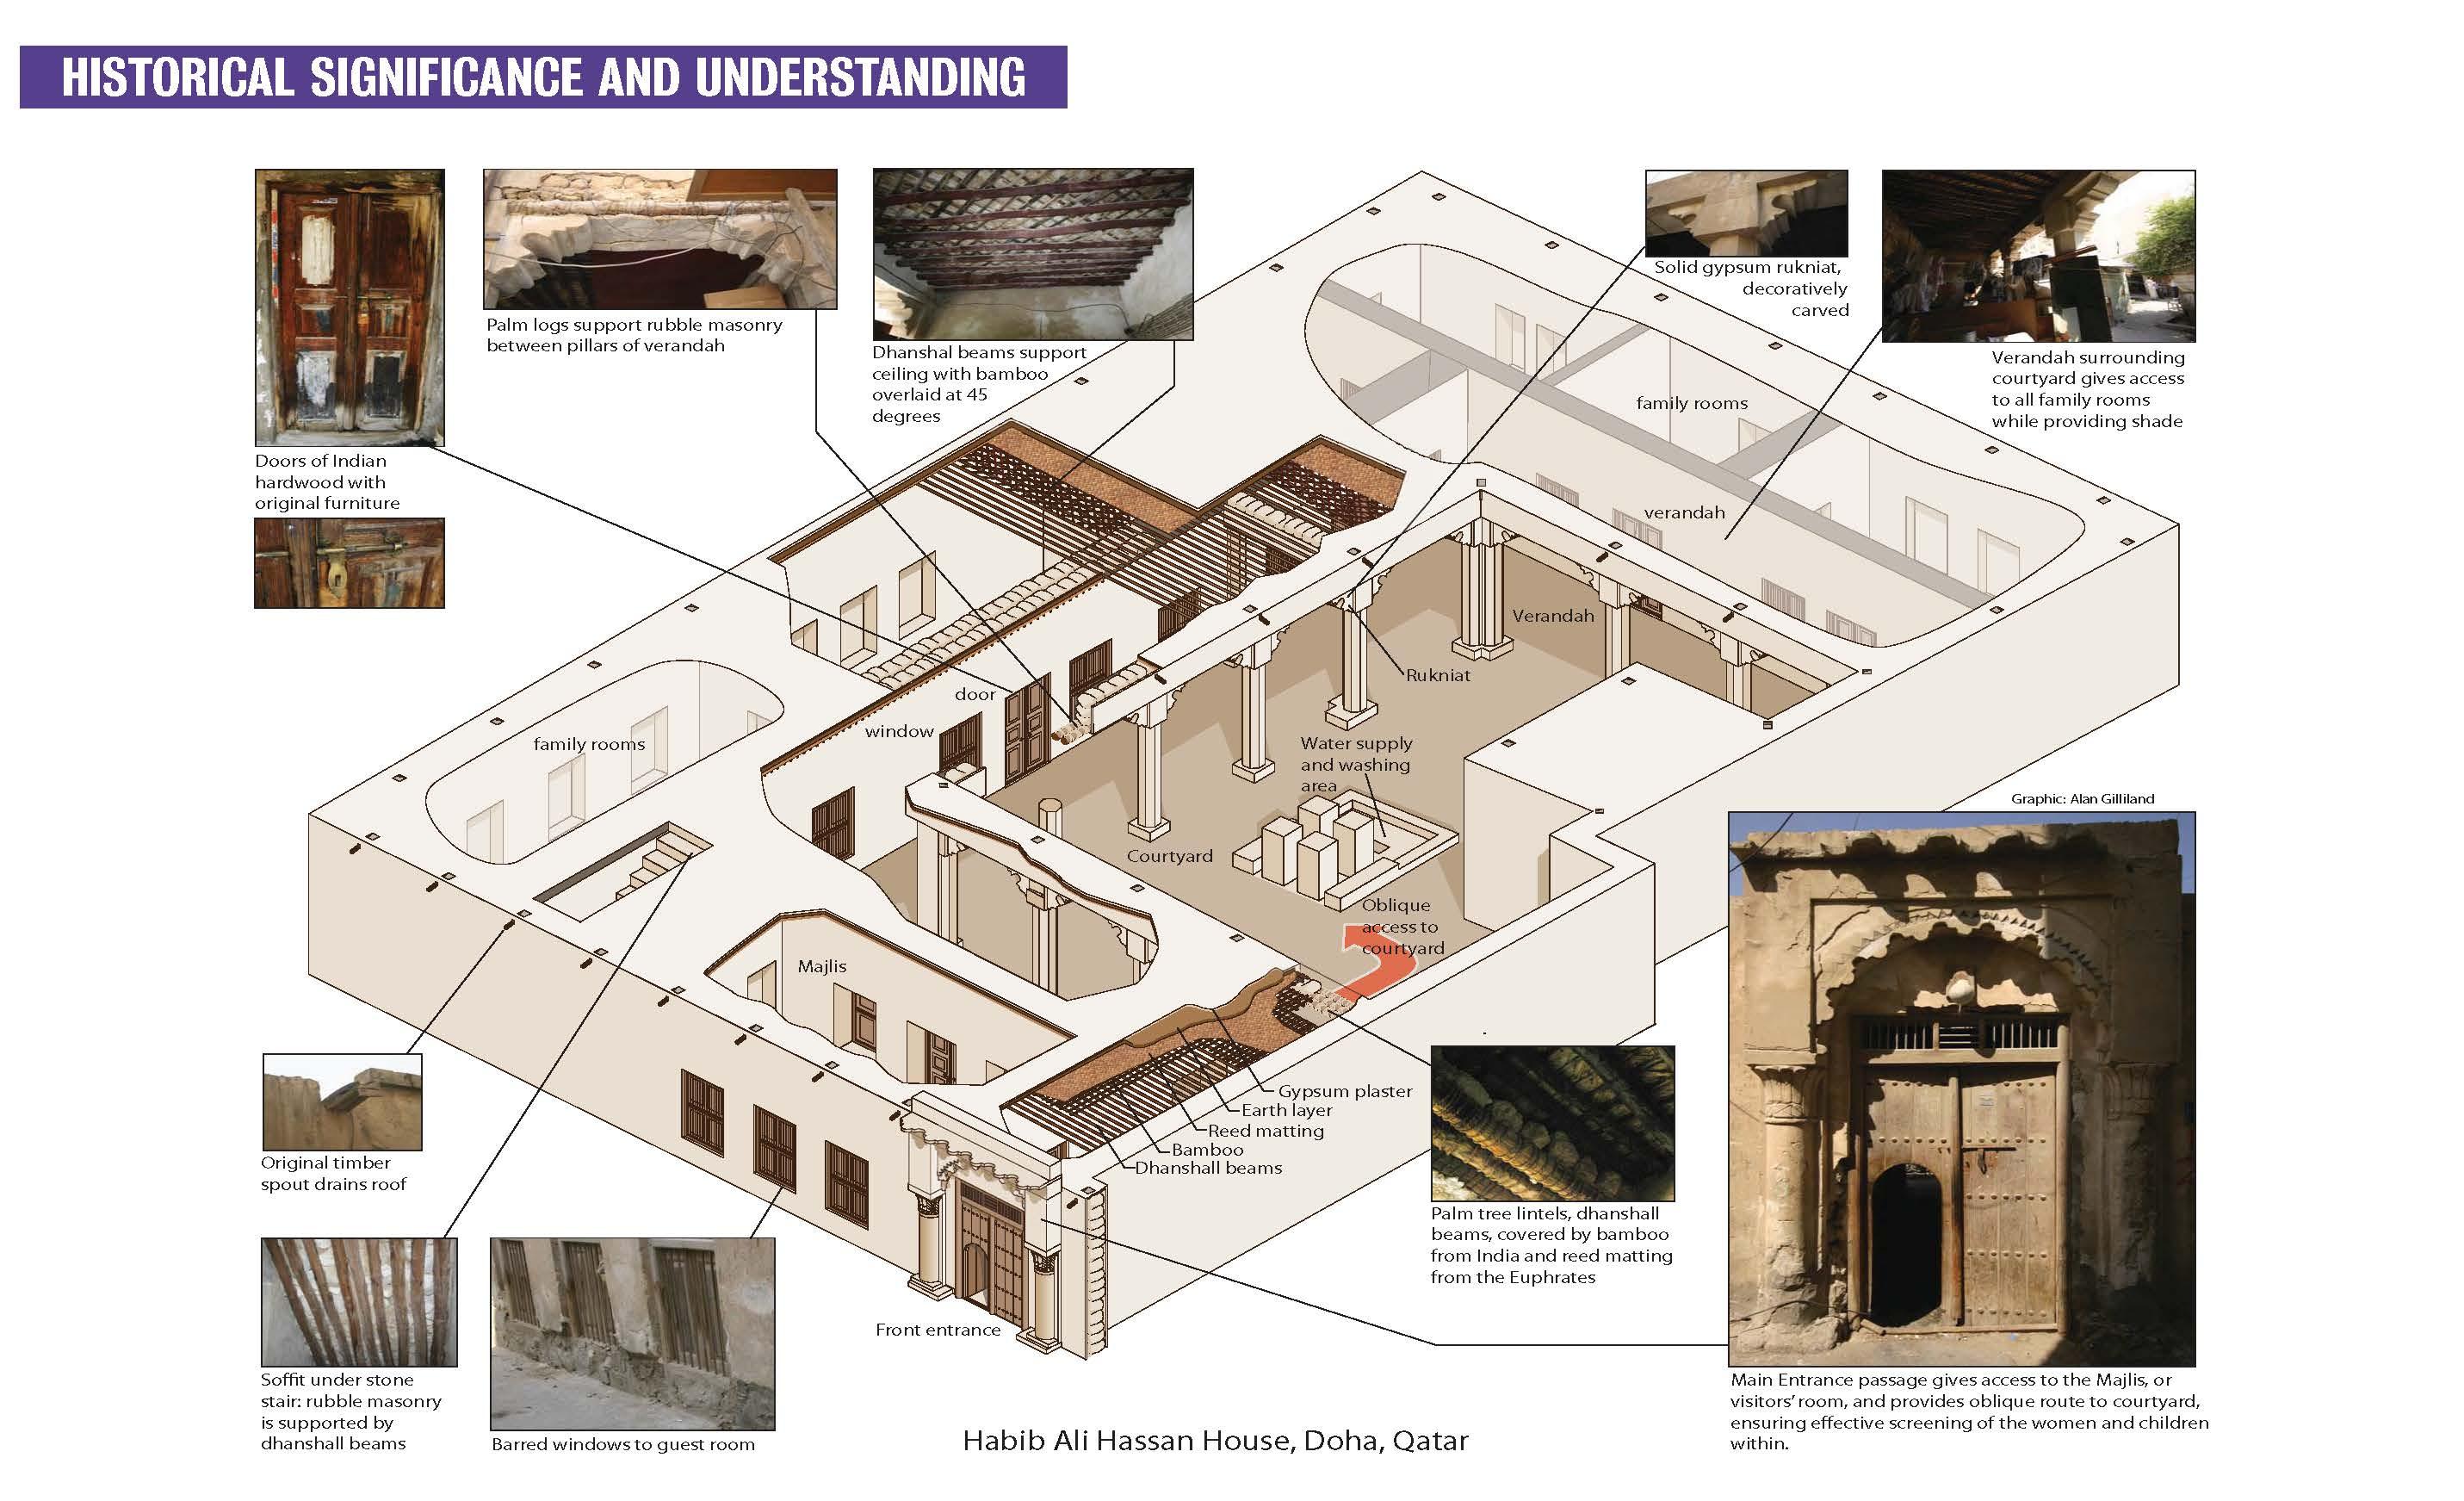 Historical Significance John McAslan + Partners}